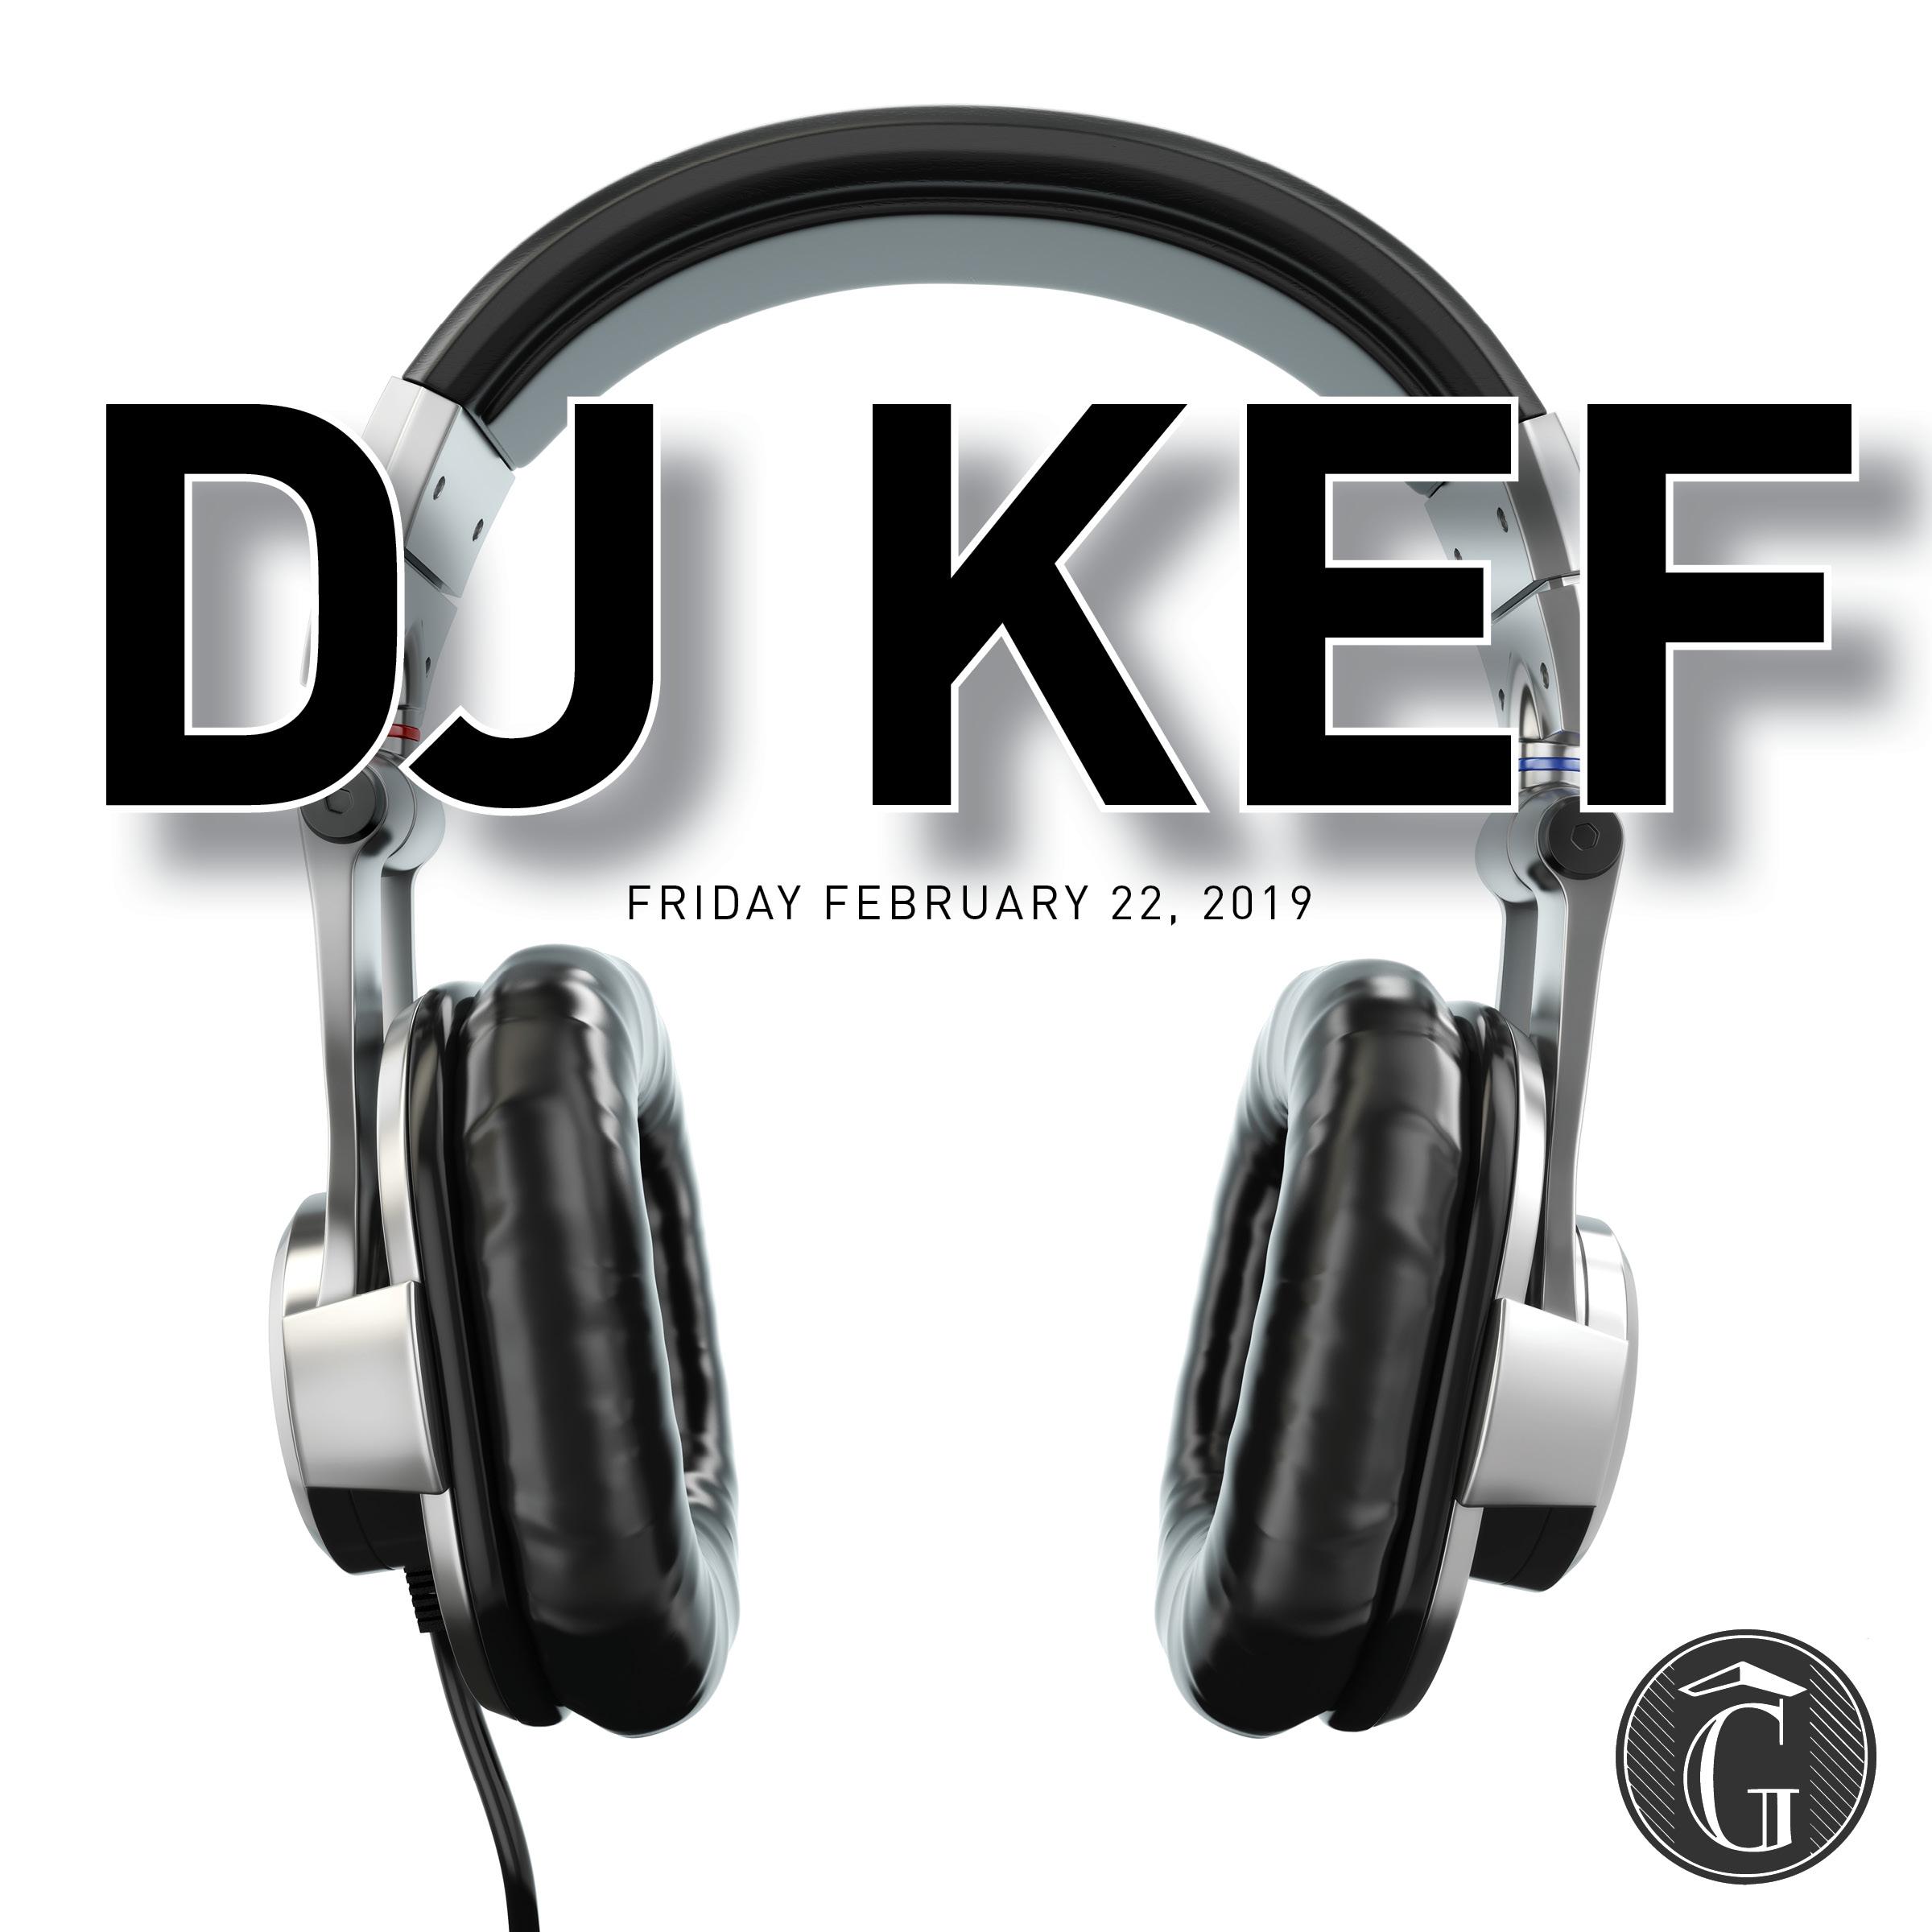 DJ KEF 02.22.19.jpg